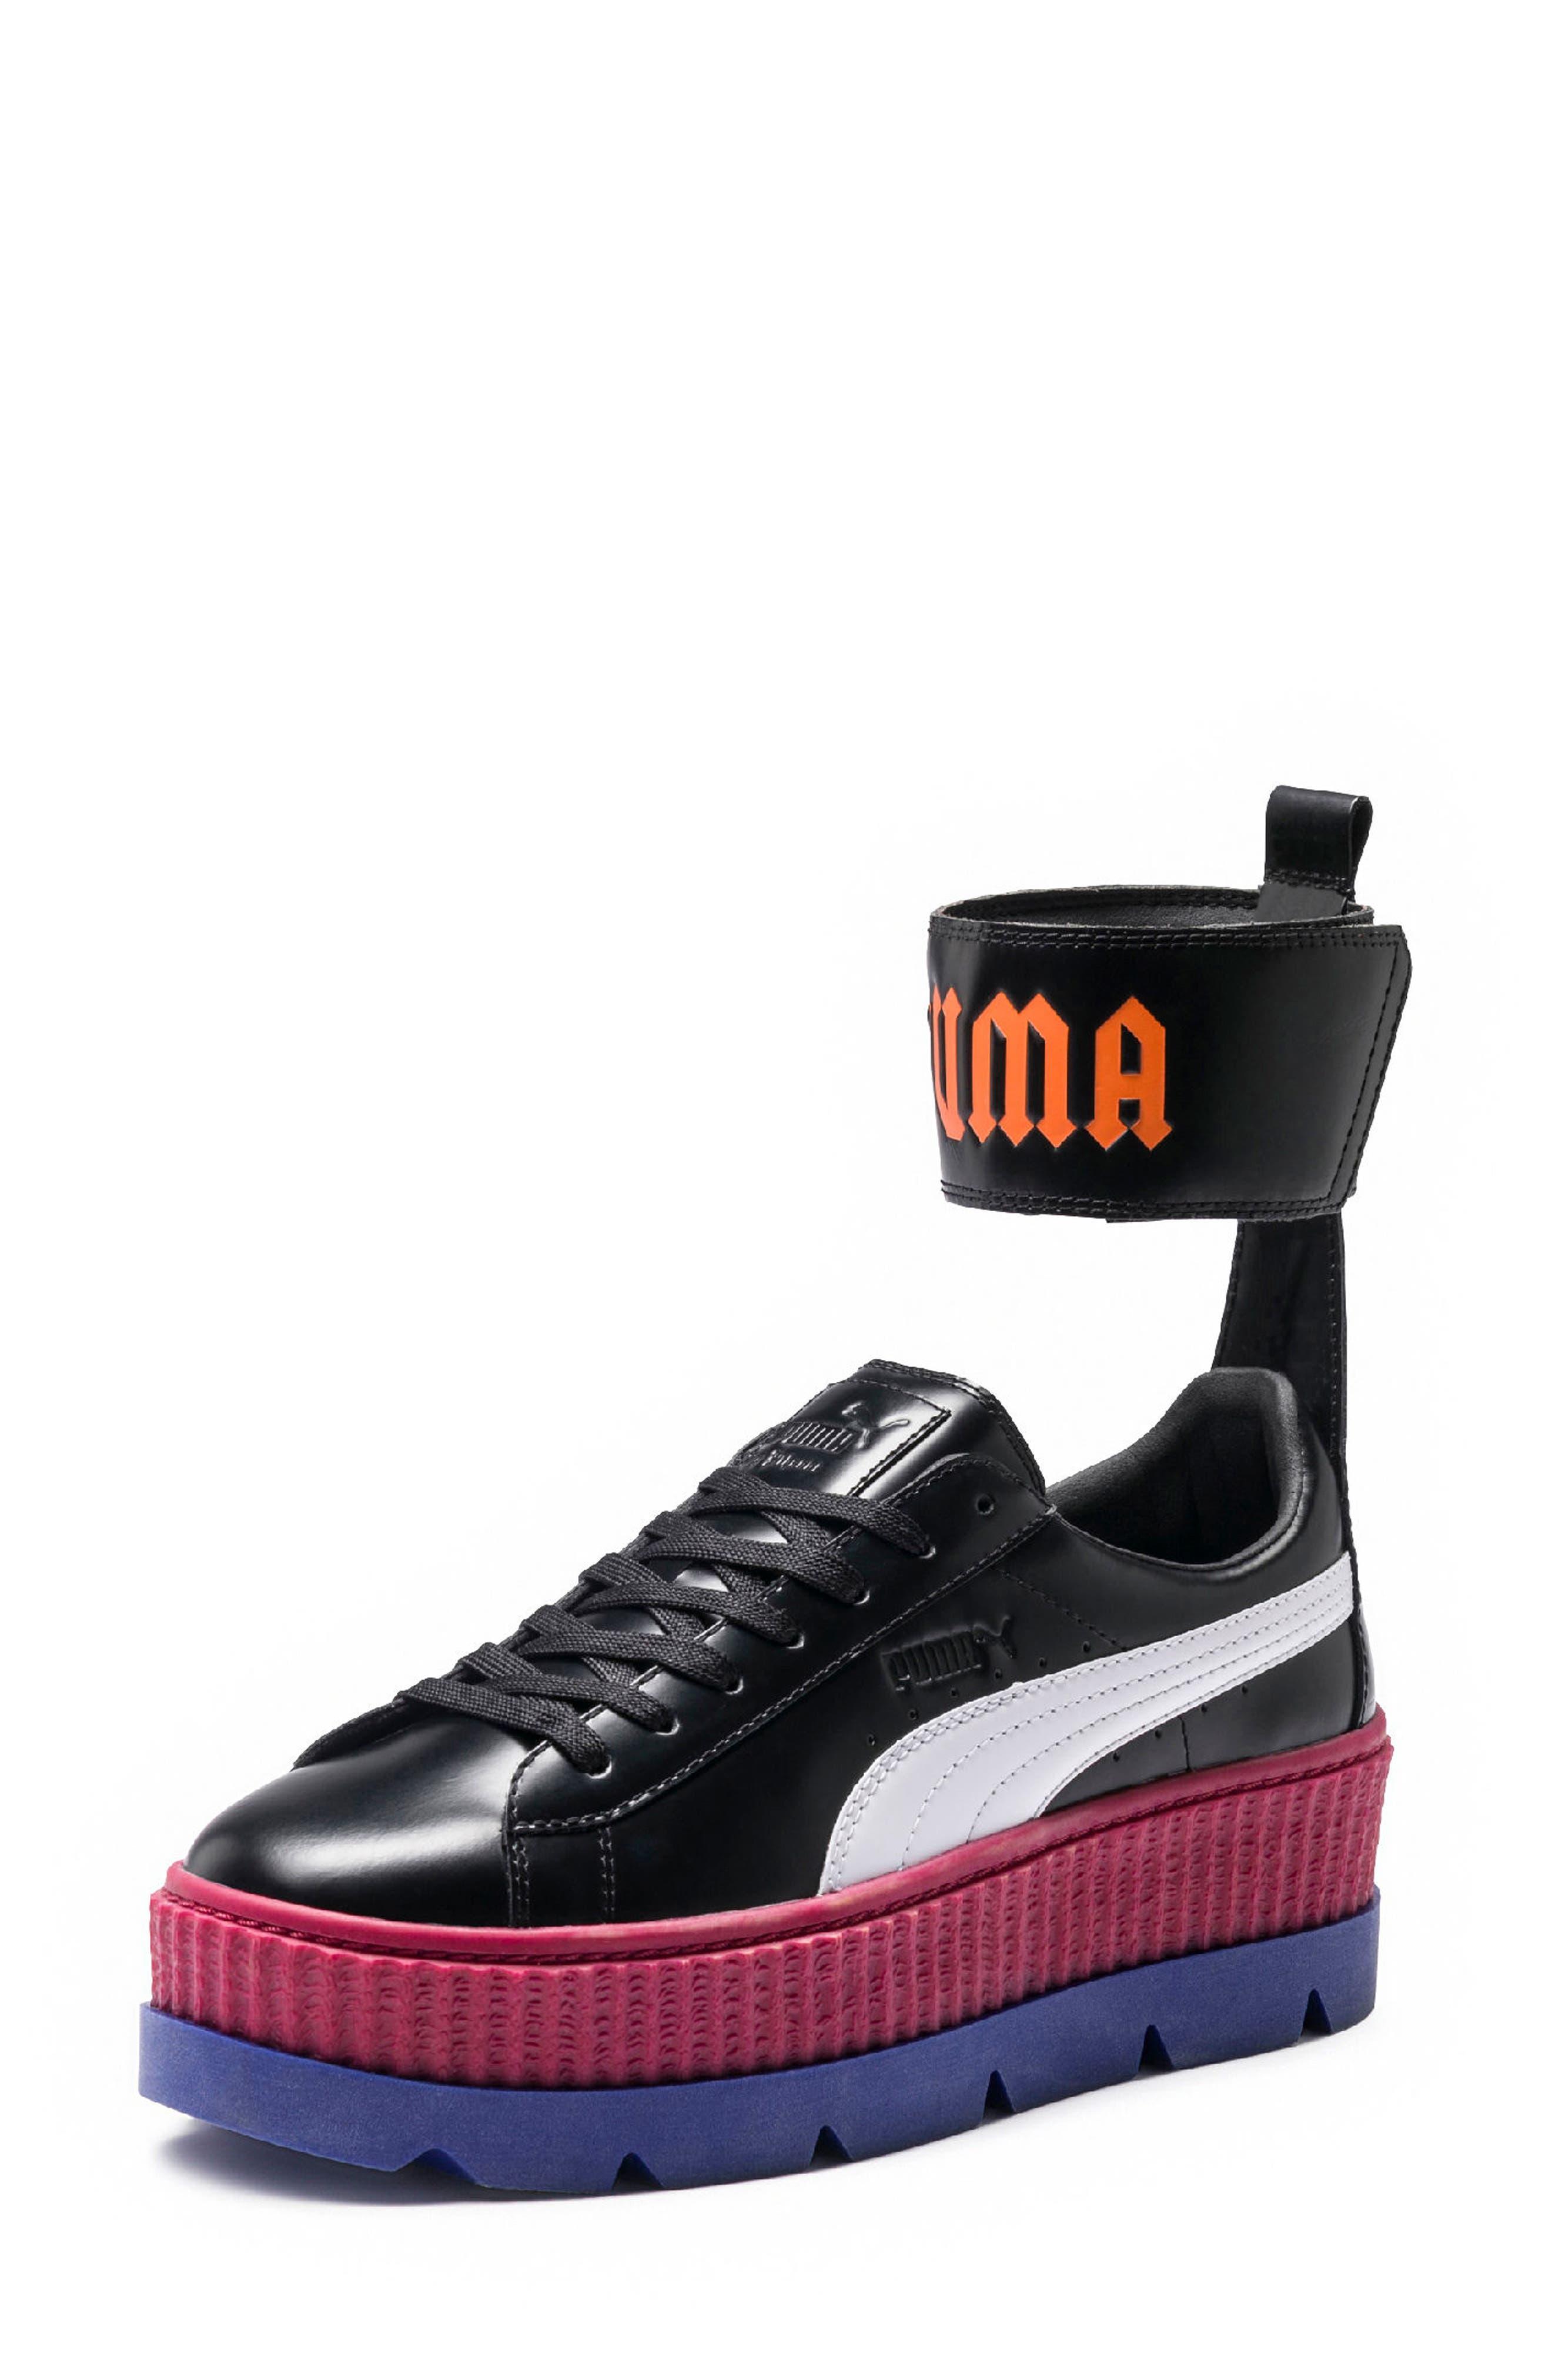 FENTY PUMA by Rihanna Ankle Strap Creeper Sneaker,                             Main thumbnail 1, color,                             001